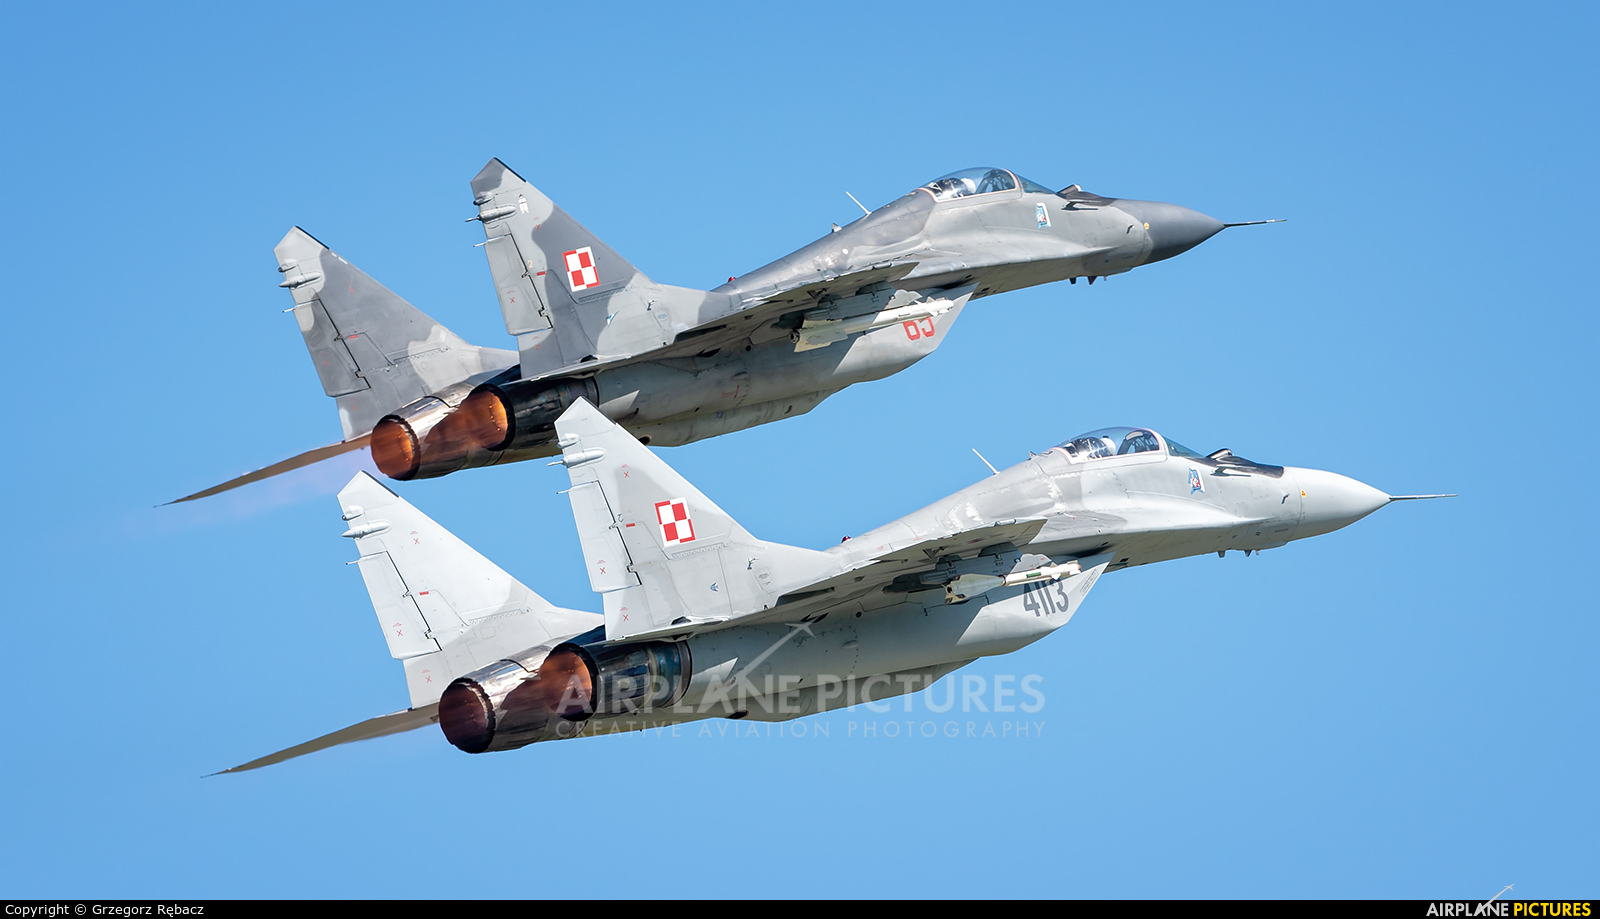 Poland - Air Force 4113 aircraft at Gdynia- Babie Doły (Oksywie)